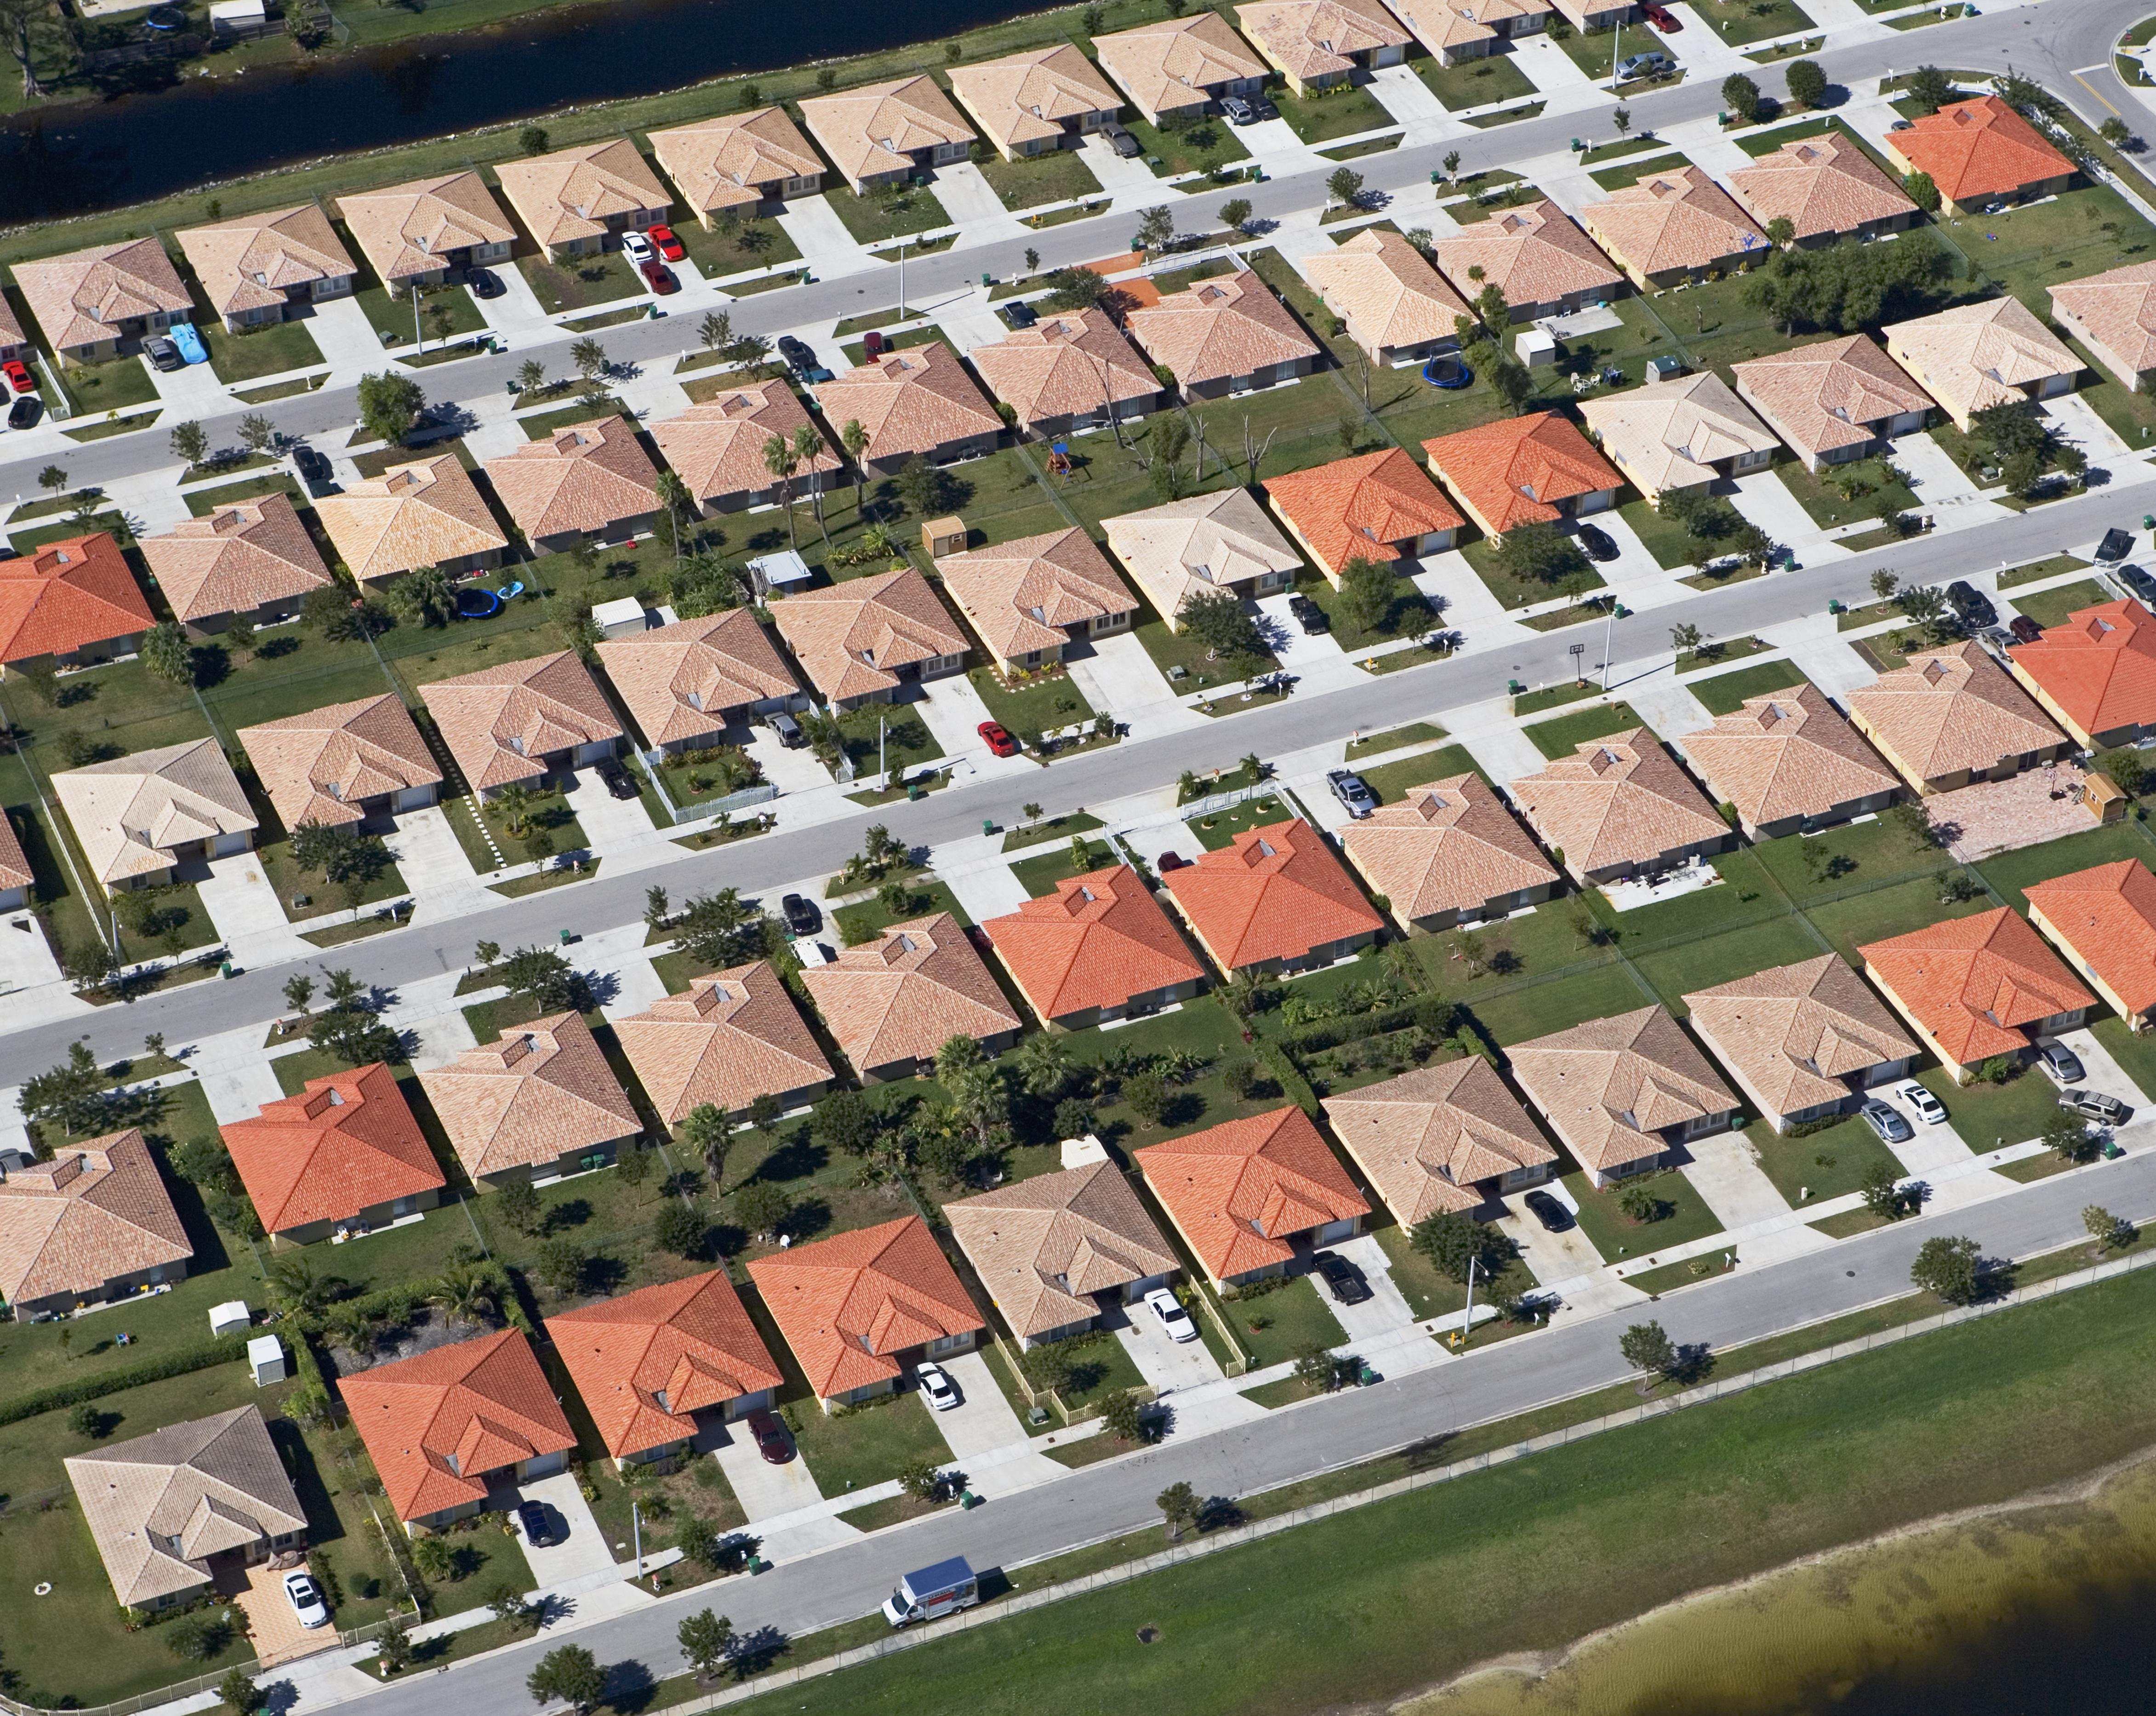 An aerial view of a suburban neighborhood.